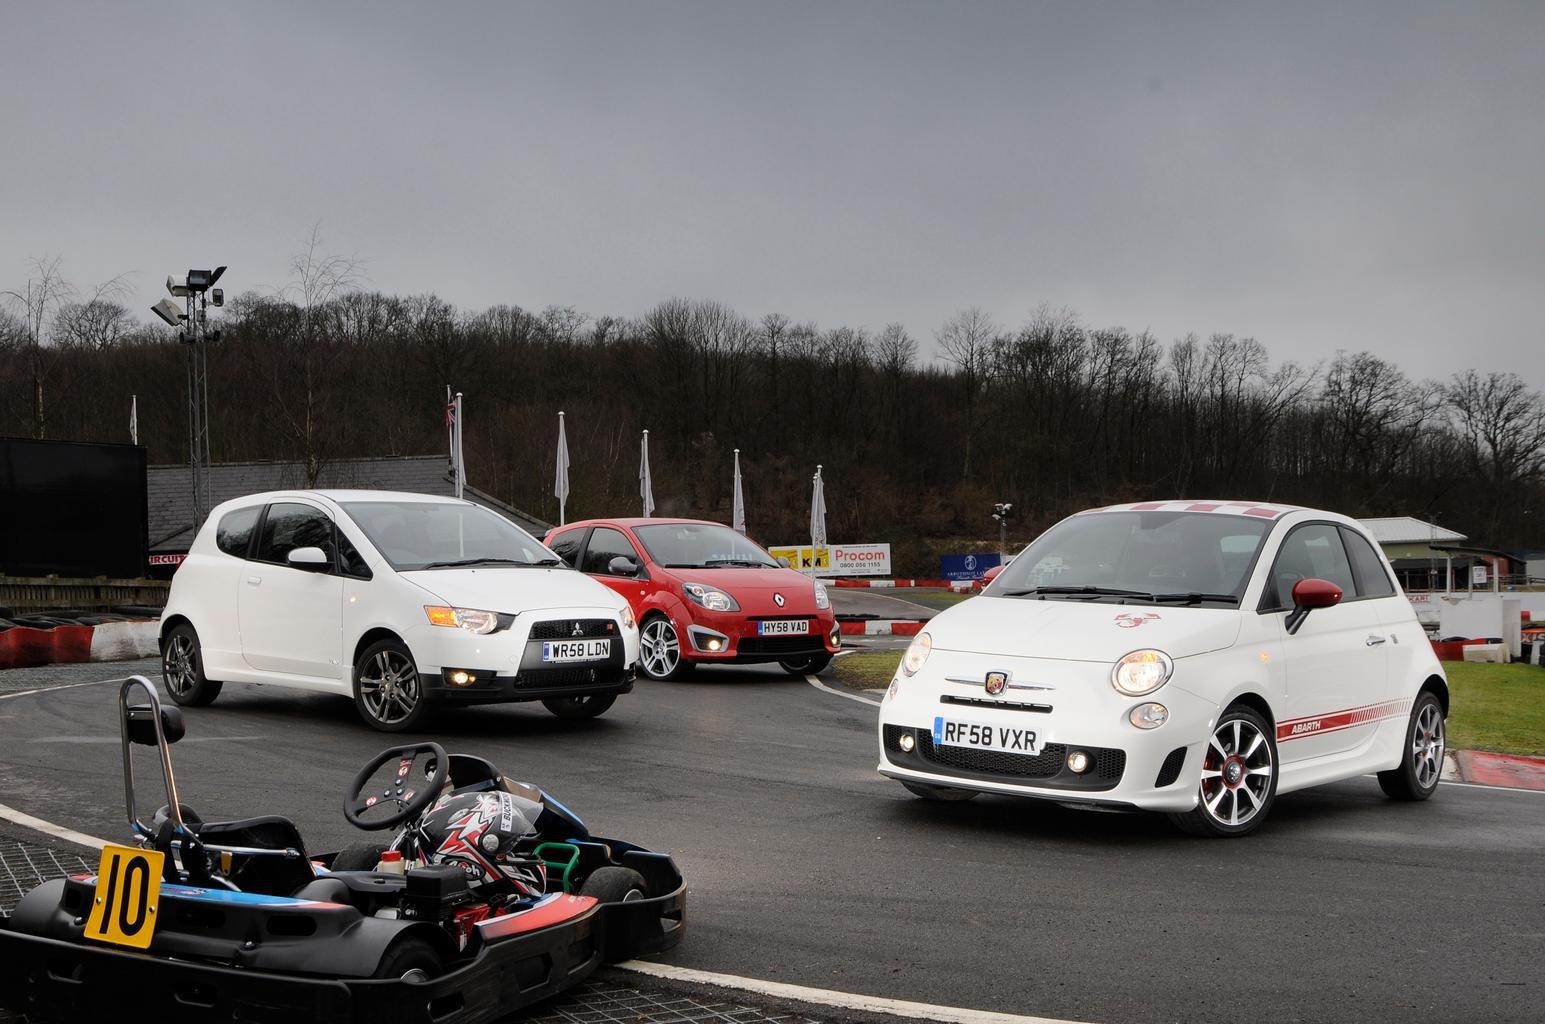 Used test: Renault Twingo Renault Sport vs Fiat 500 Abarth vs Mitsubishi Colt Ralliart